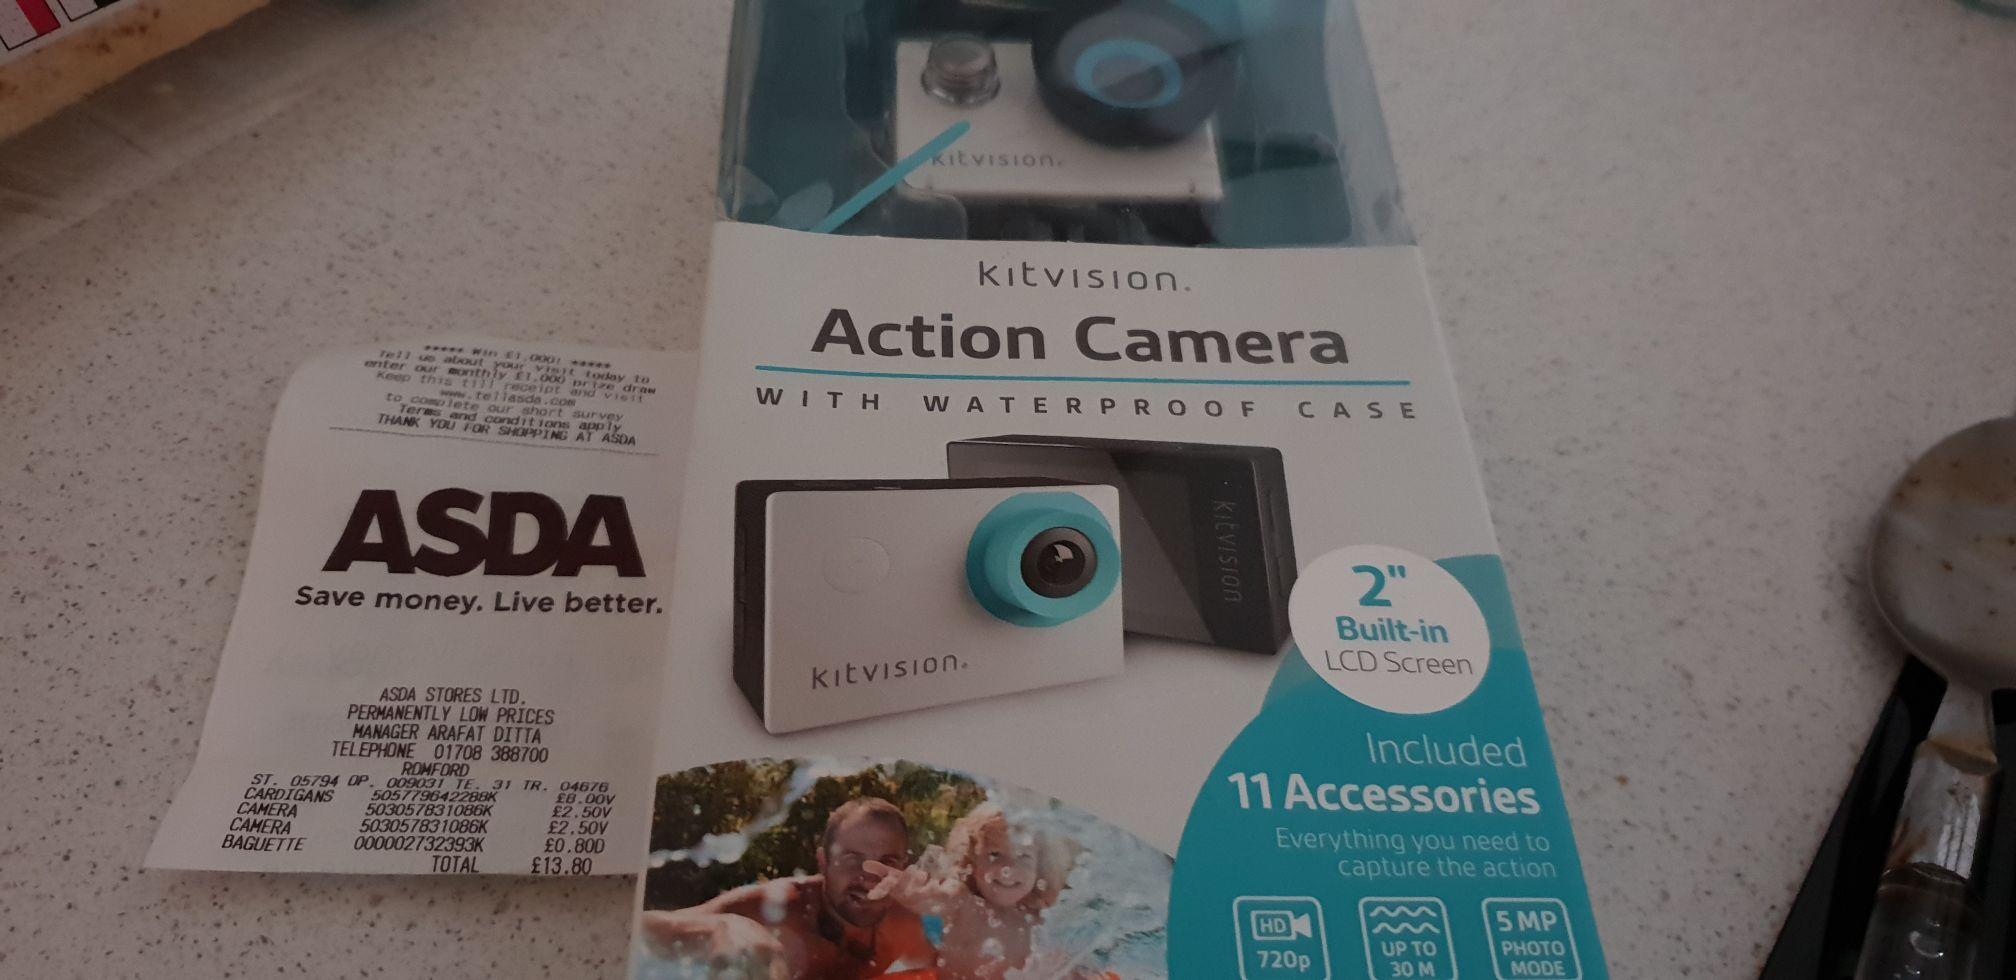 Kitvision Action Camera £2.50 Asda Romford